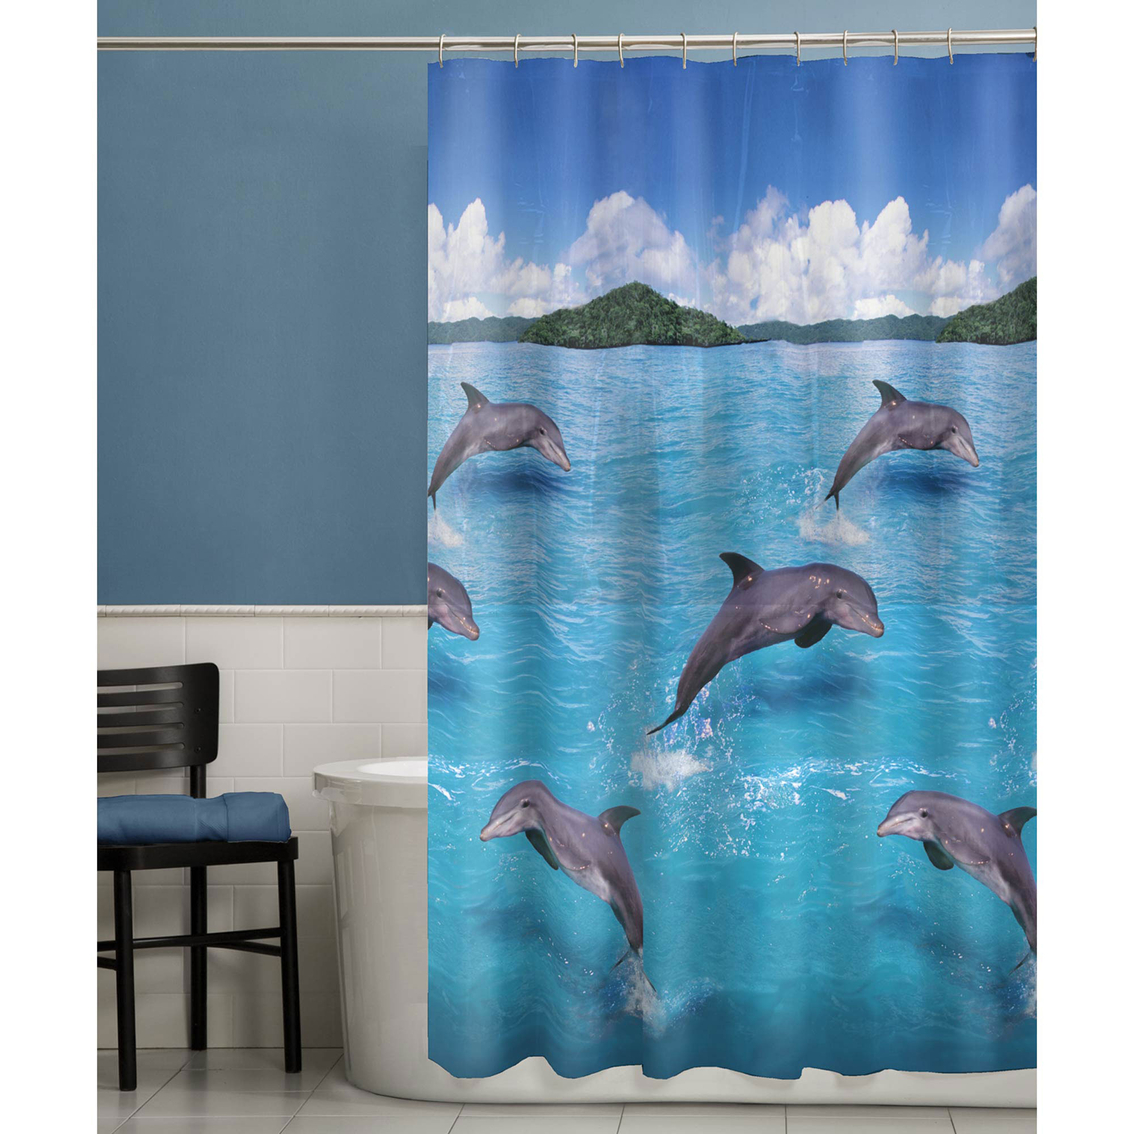 Maytex Splash Dolphins PEVA Shower Curtain